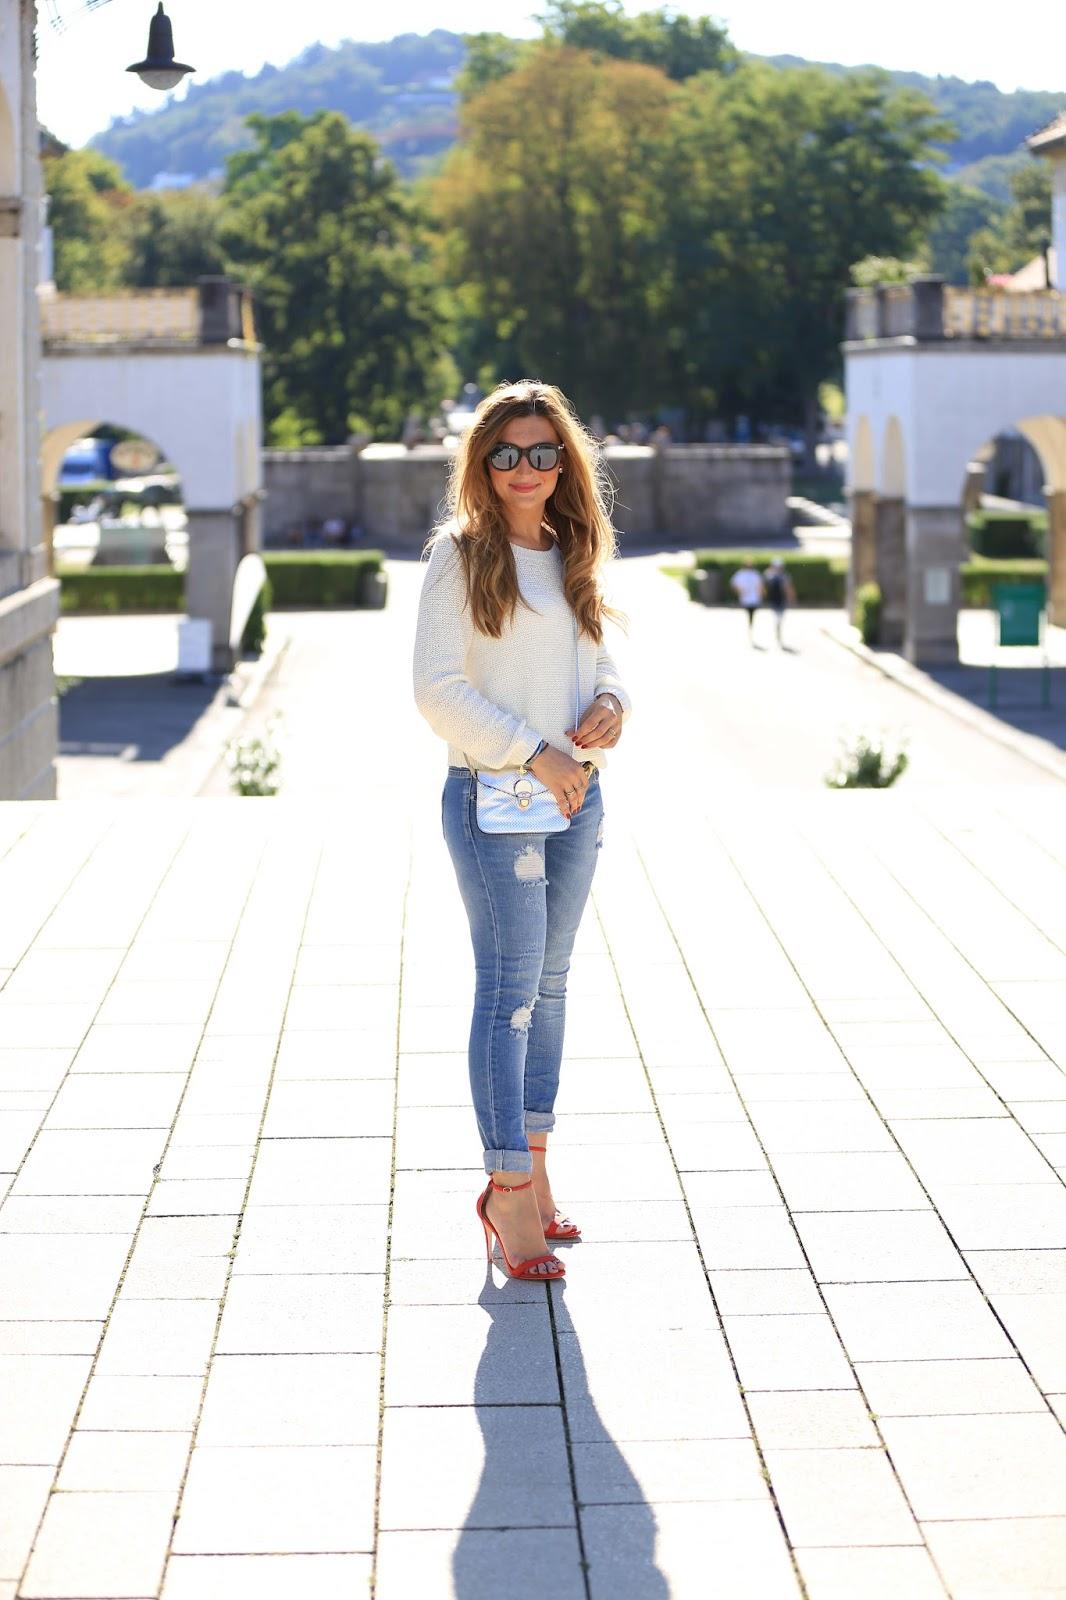 Zara-silberne Tasche -Rote Schuhe - My Colloseum - Outfitinspiration -Dior-so-real-Fashionblogger-München-Deutschland